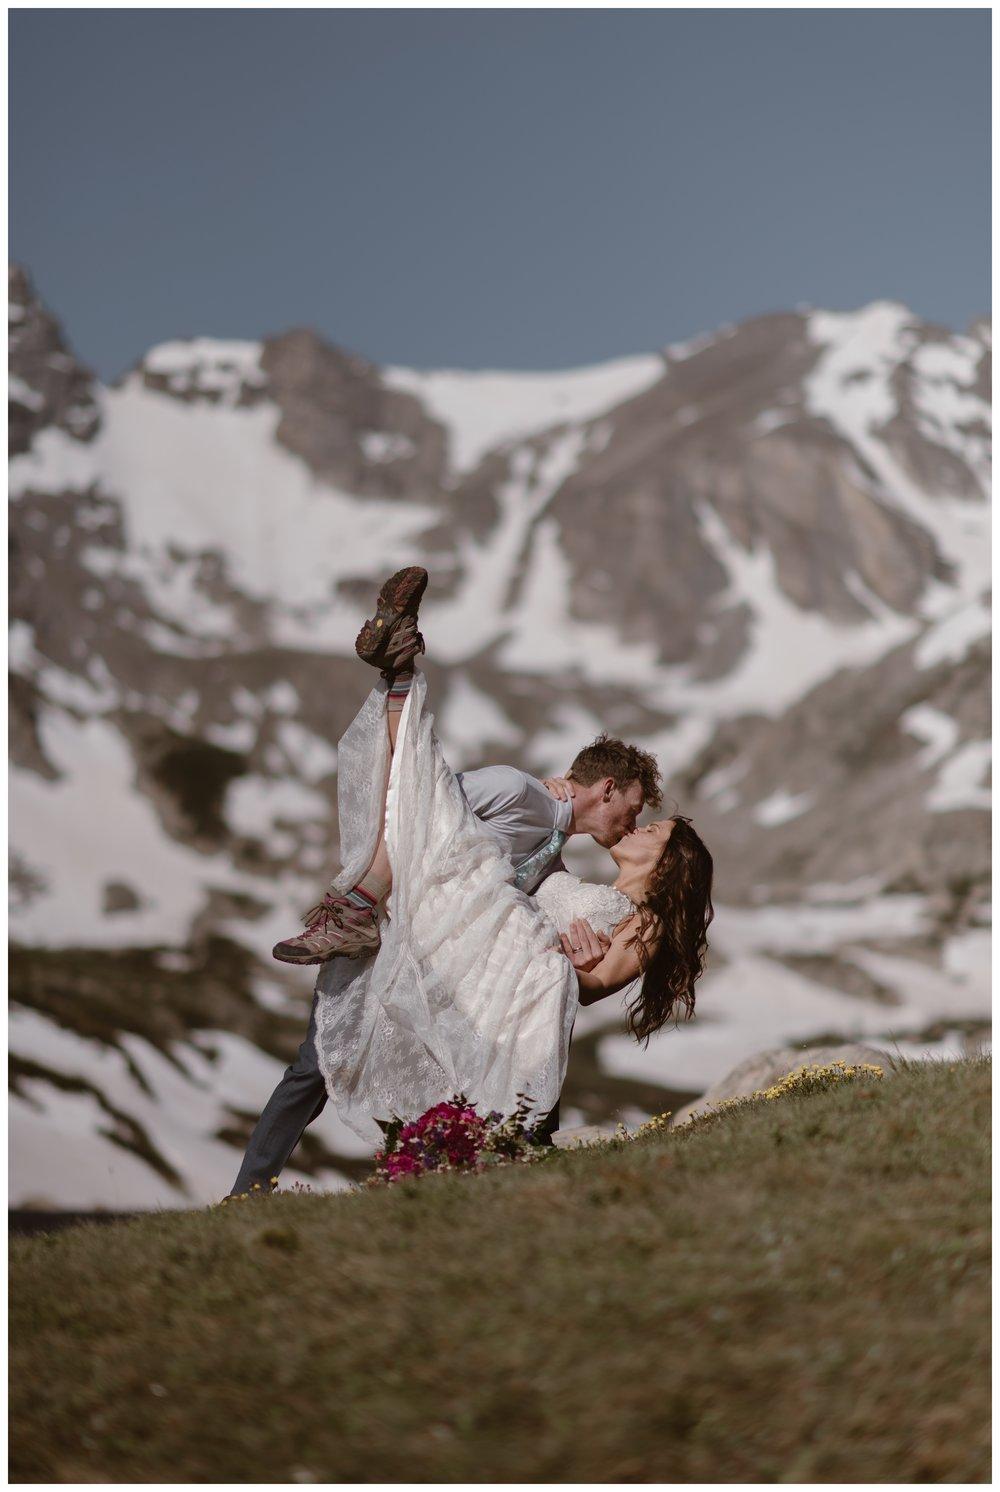 Matt dips his new bride Karen following their high alpine lake elopement ceremony outside Lake Isabelle, above Brainard Lake in Nederland, Colorado. Photo by Adventure Instead, Maddie Mae.